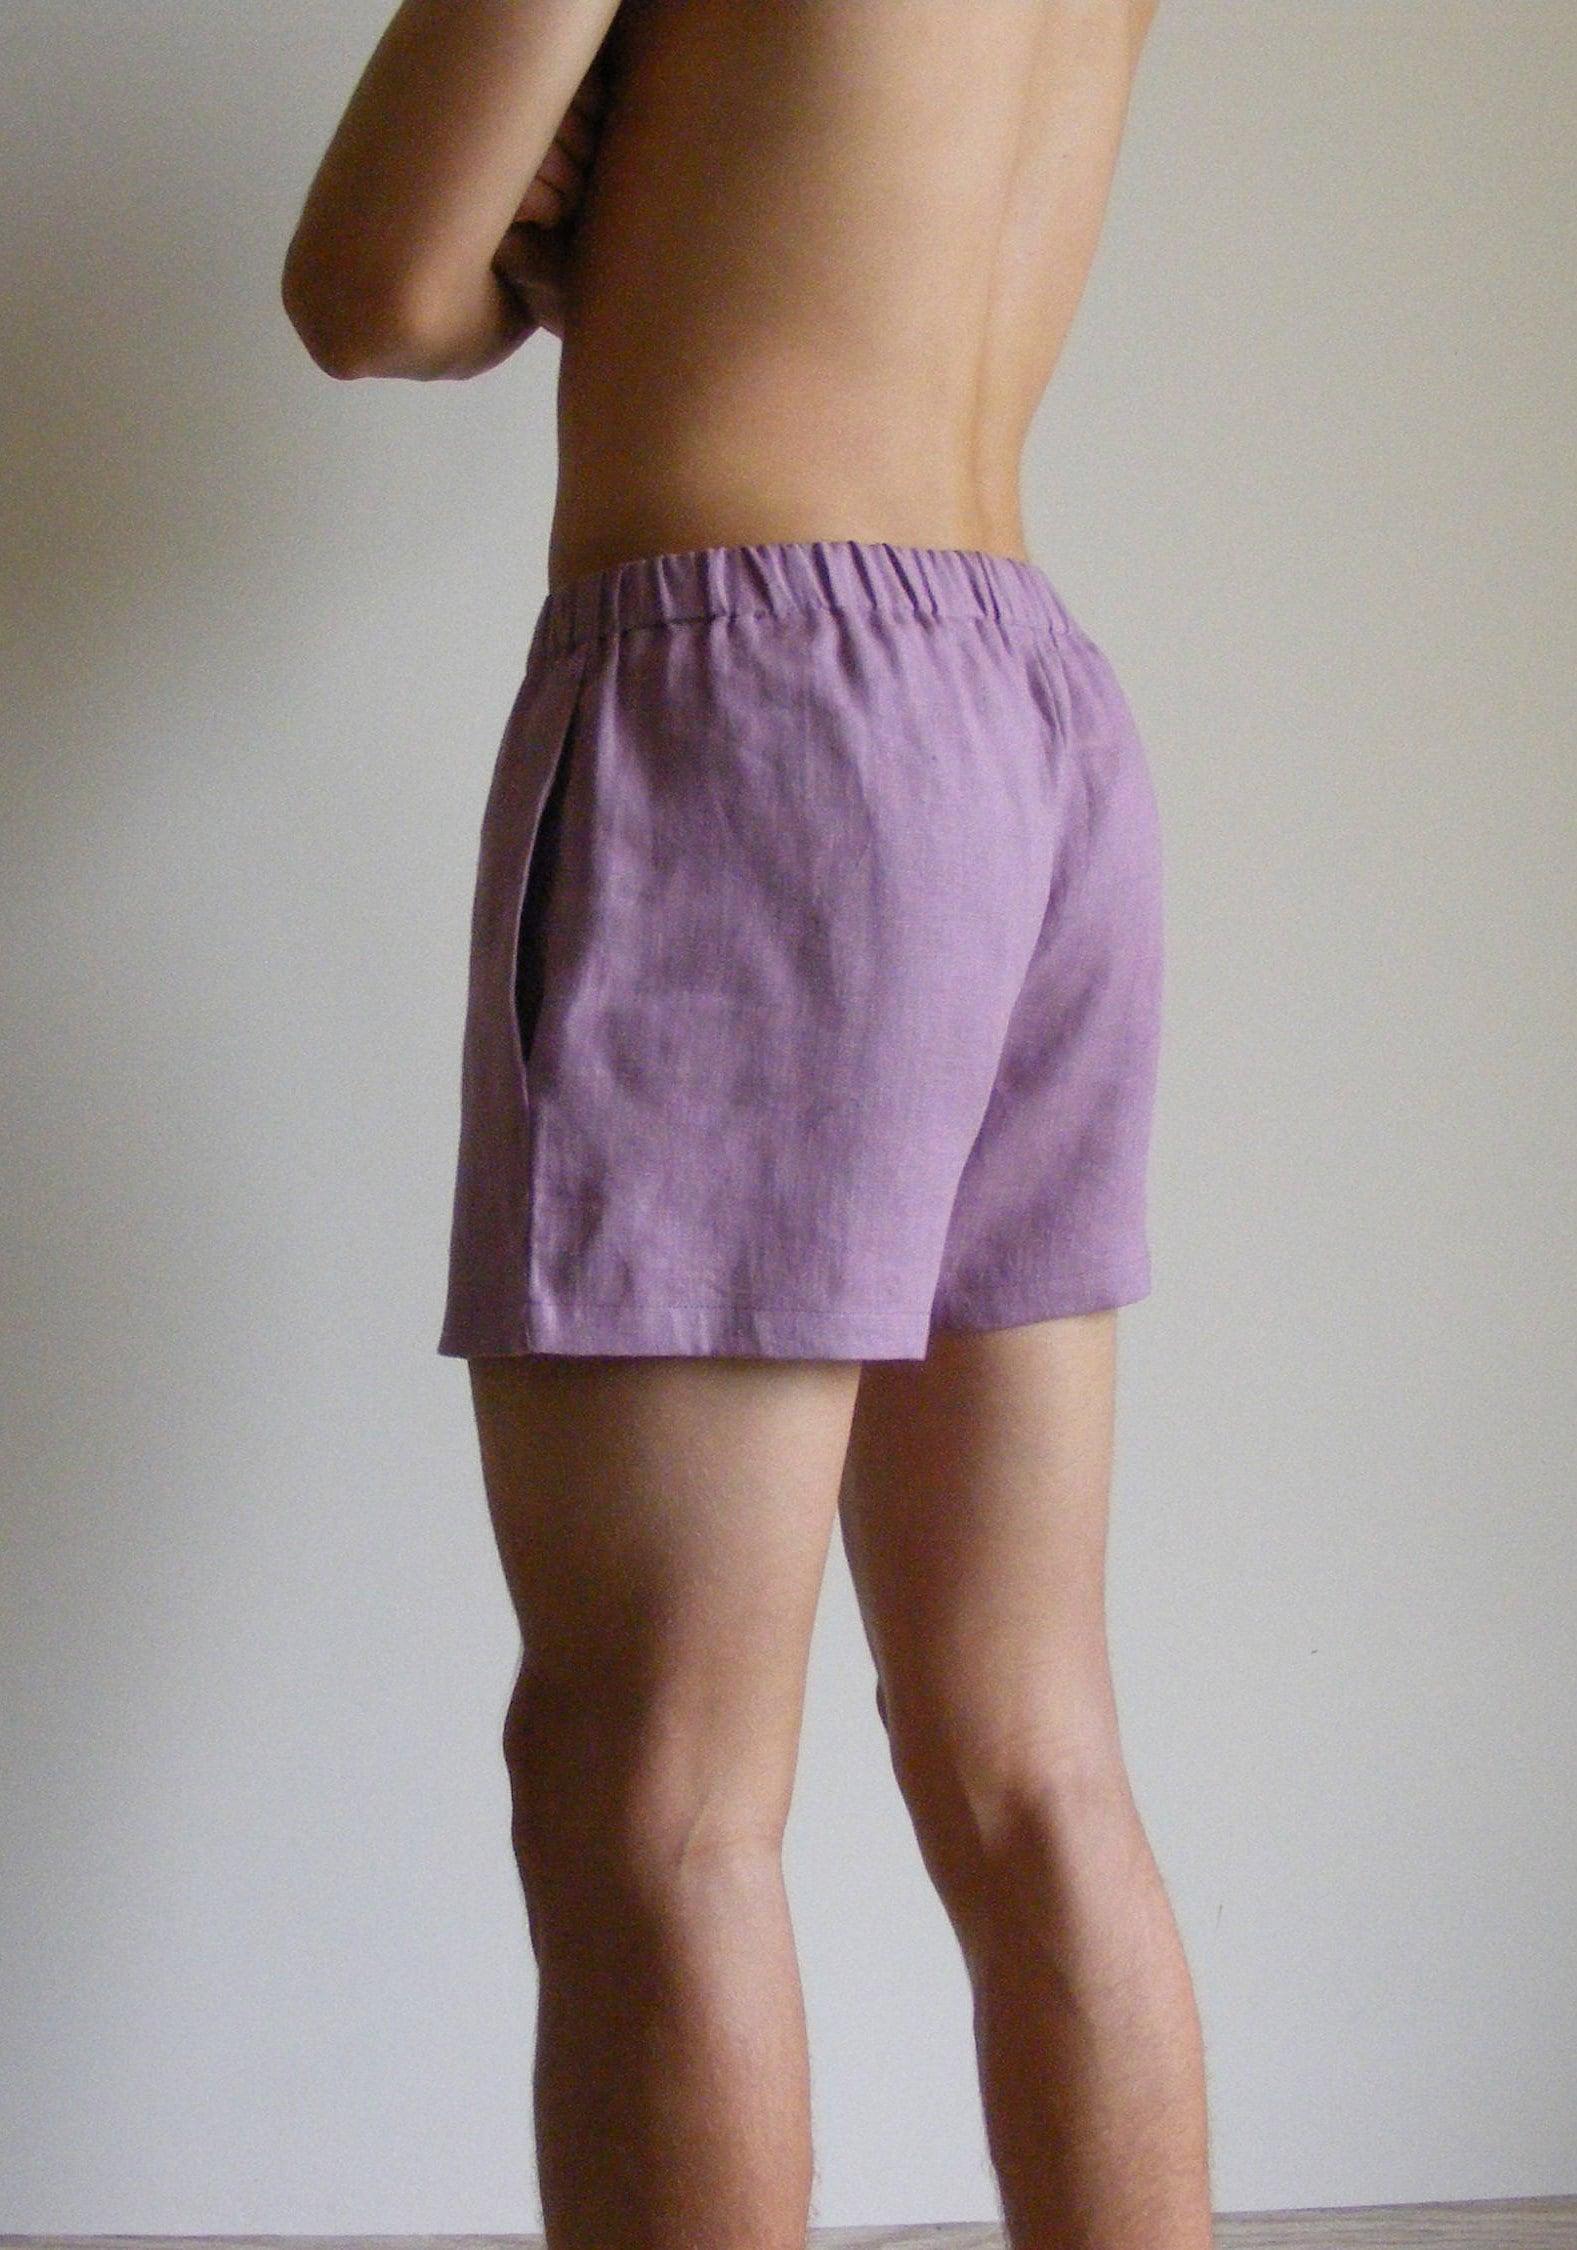 Simply Mens Linen Shorts / Dusty Pink / 100% Linen / Men's Linen Shorts / Boxers / Boxer Shorts Iaaq8QlXl